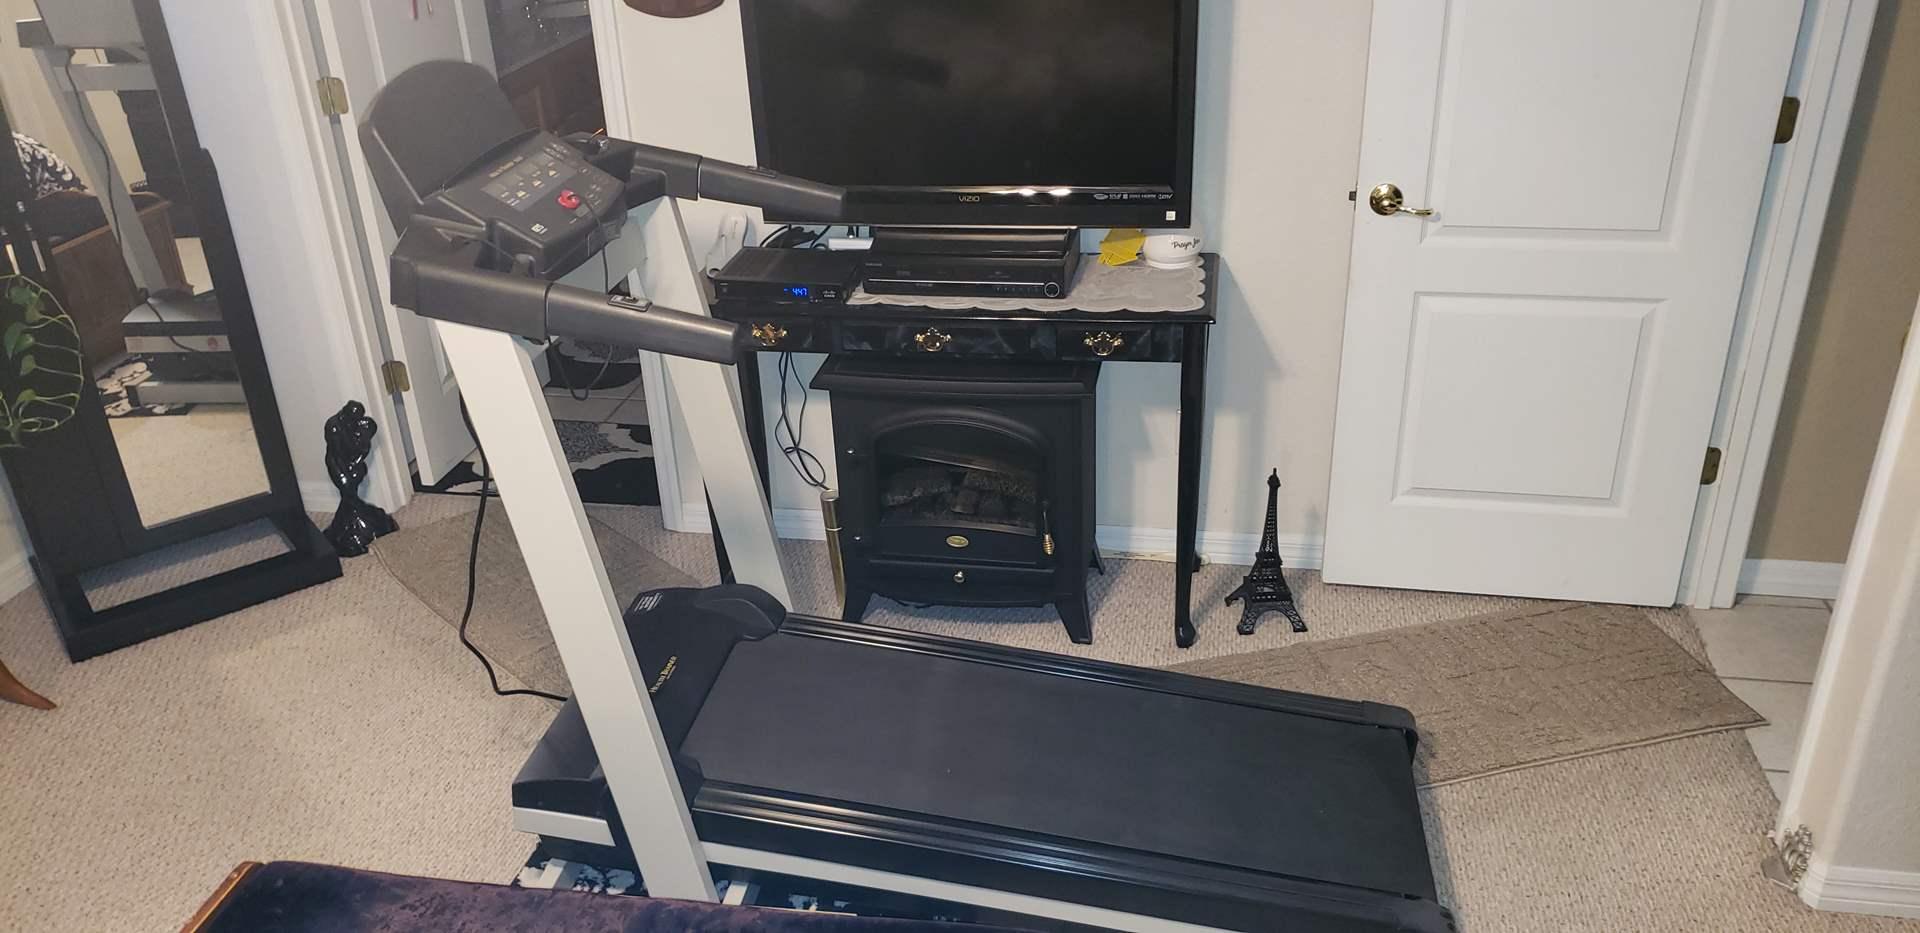 Lot # 419 Health Trainer 500 Treadmill - Works Great